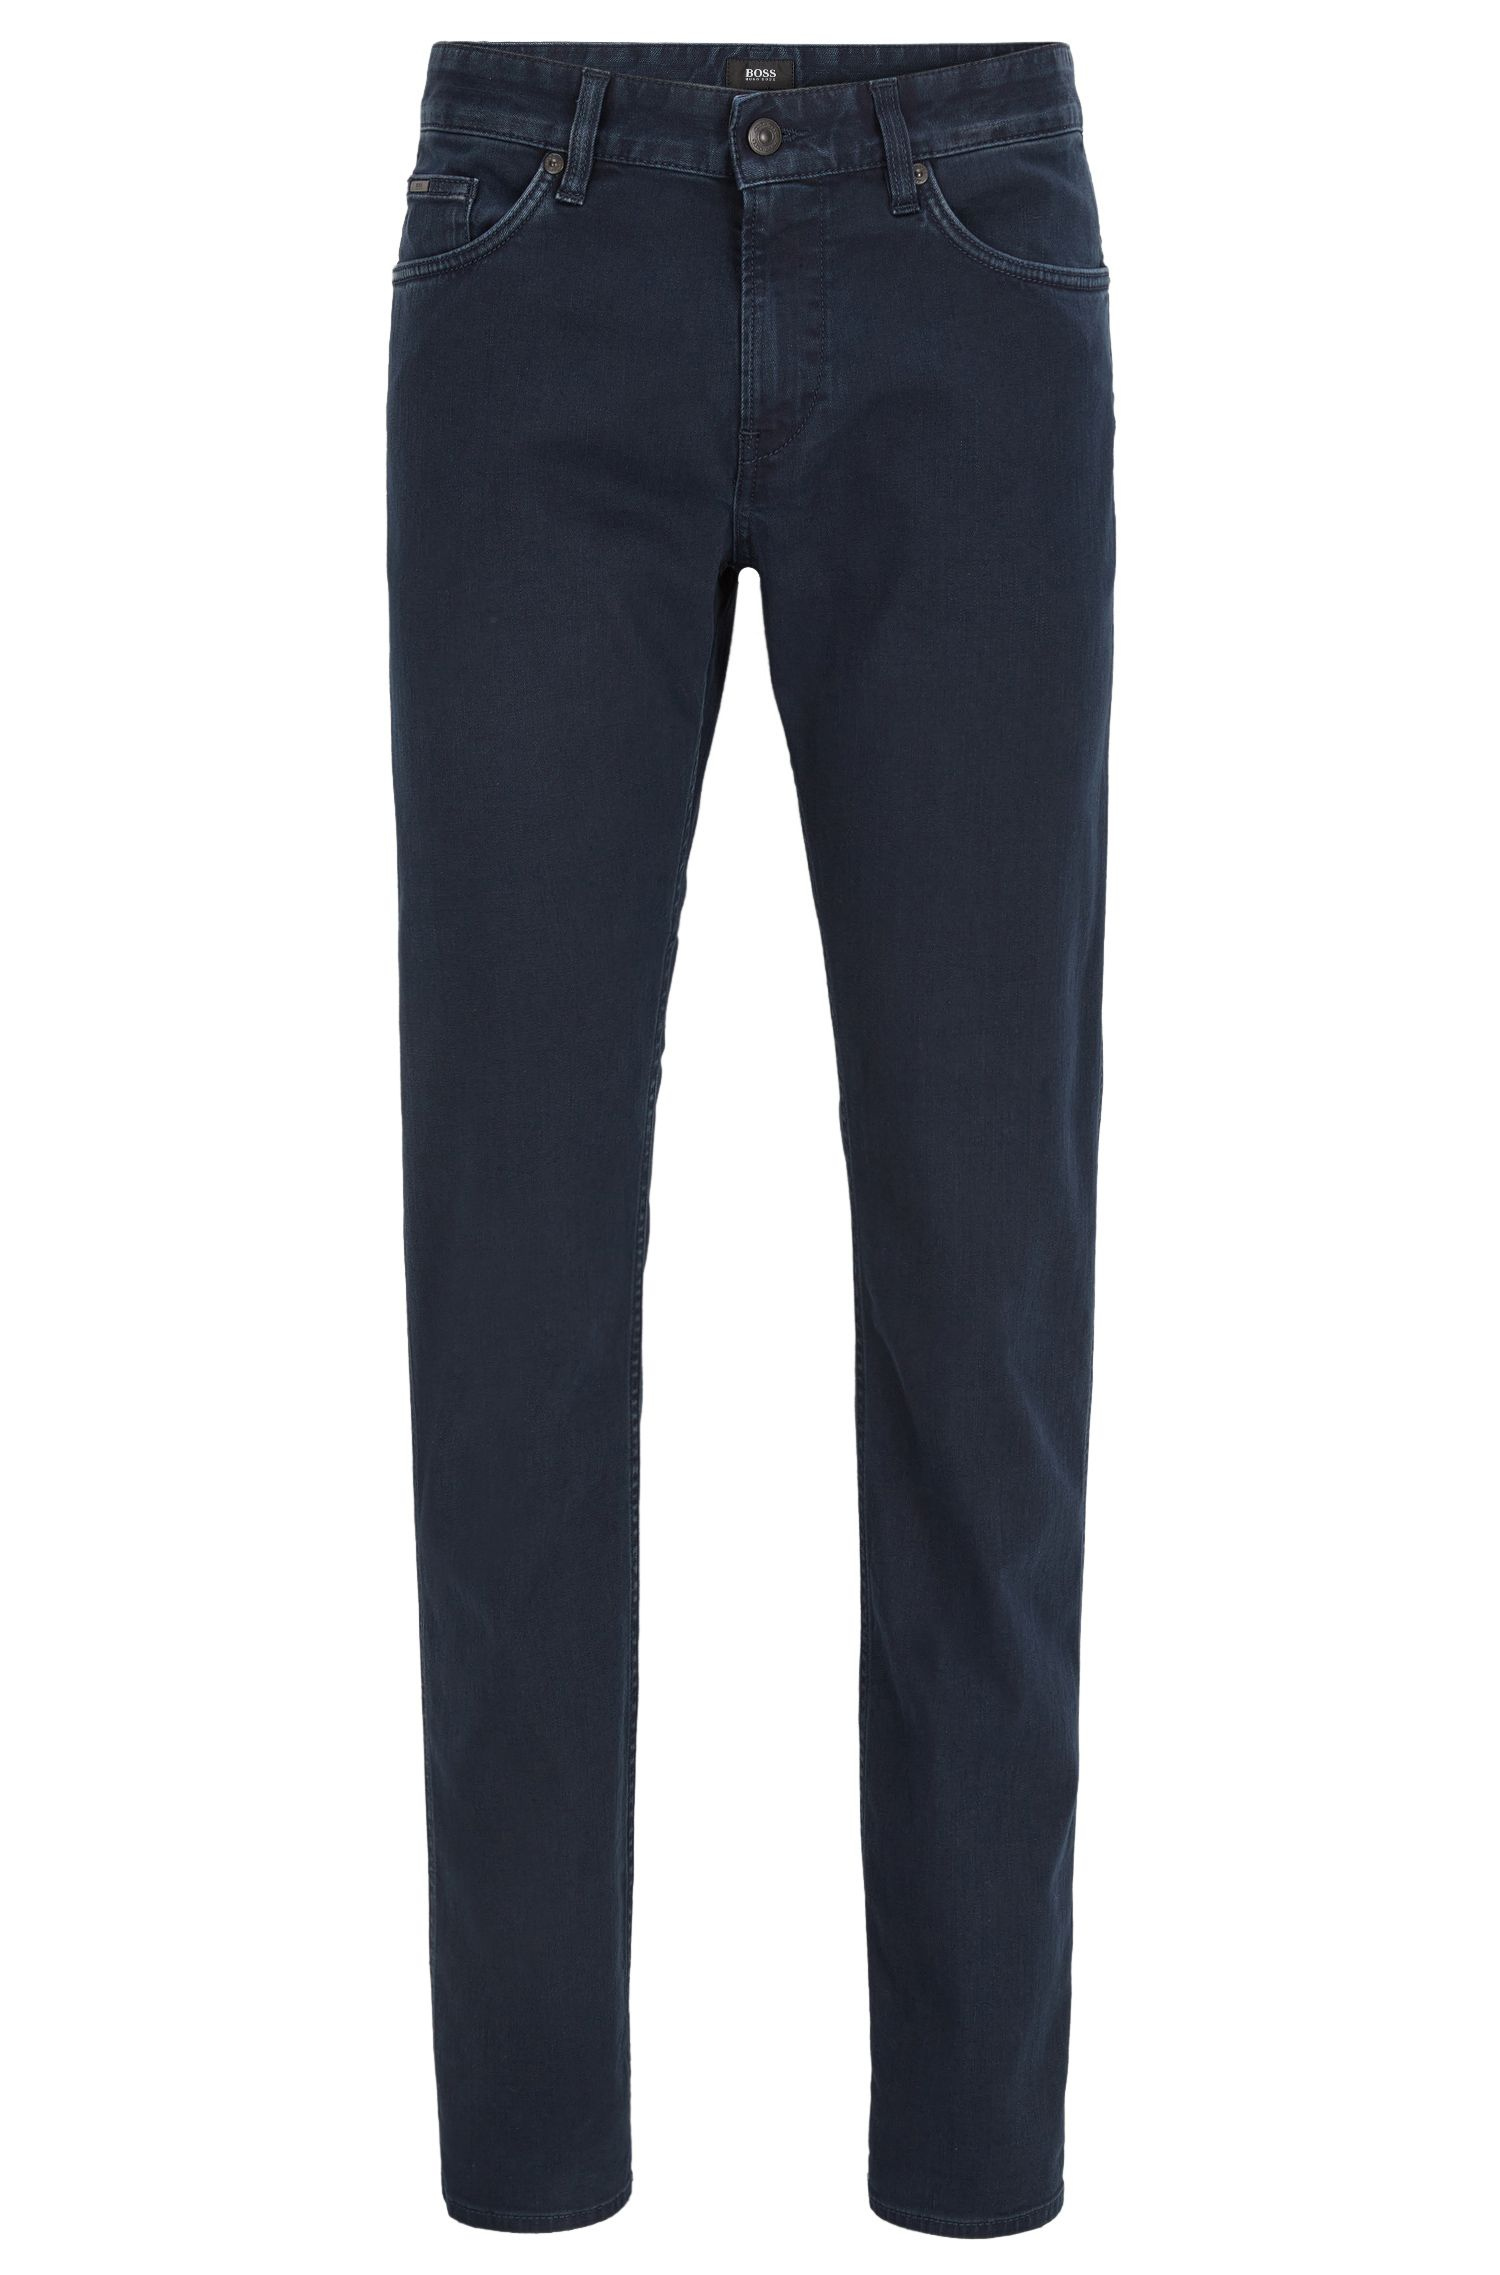 Stretch Cotton Jean, Slim Fit | Delaware, Dark Blue